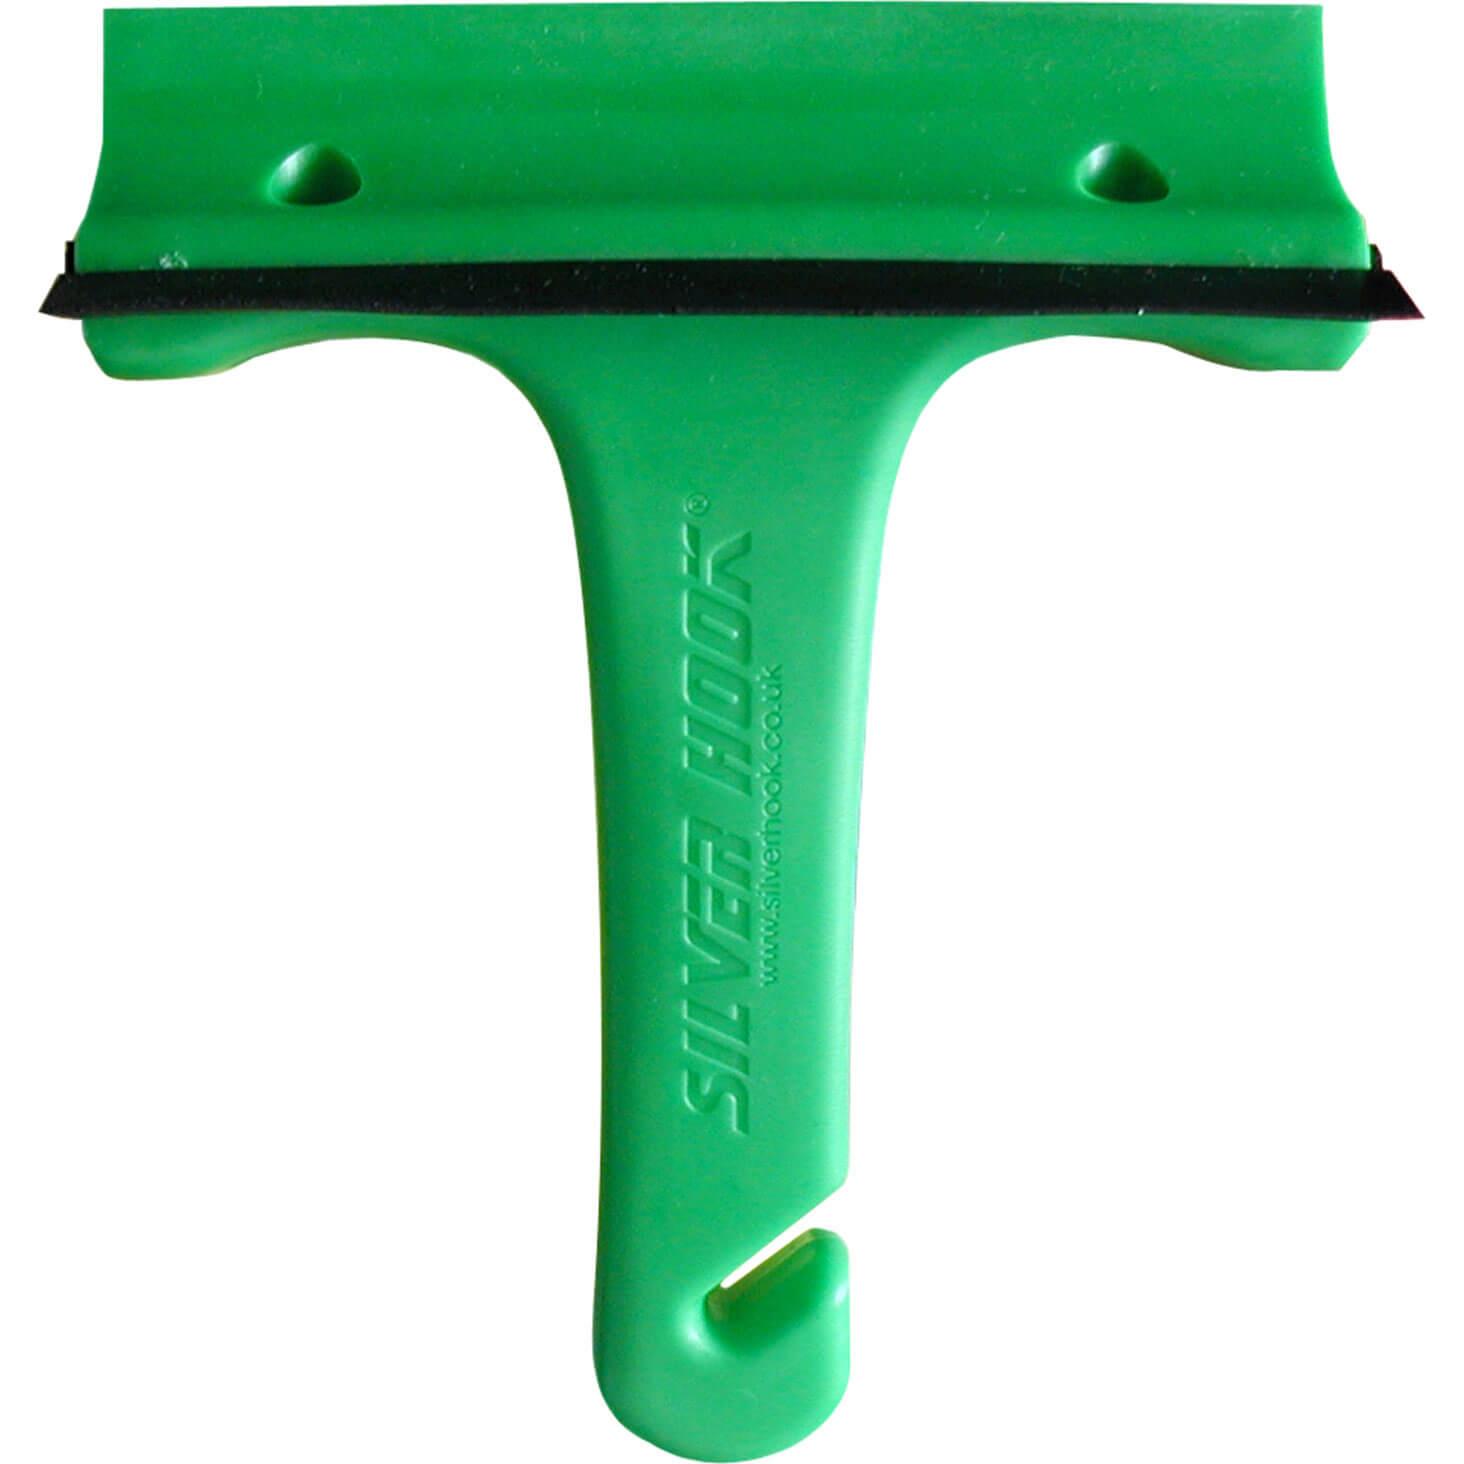 Tooled Up/Car & Van/Automotive Tools & Parts/Silver Hook Ice Scraper & Squeegee Green